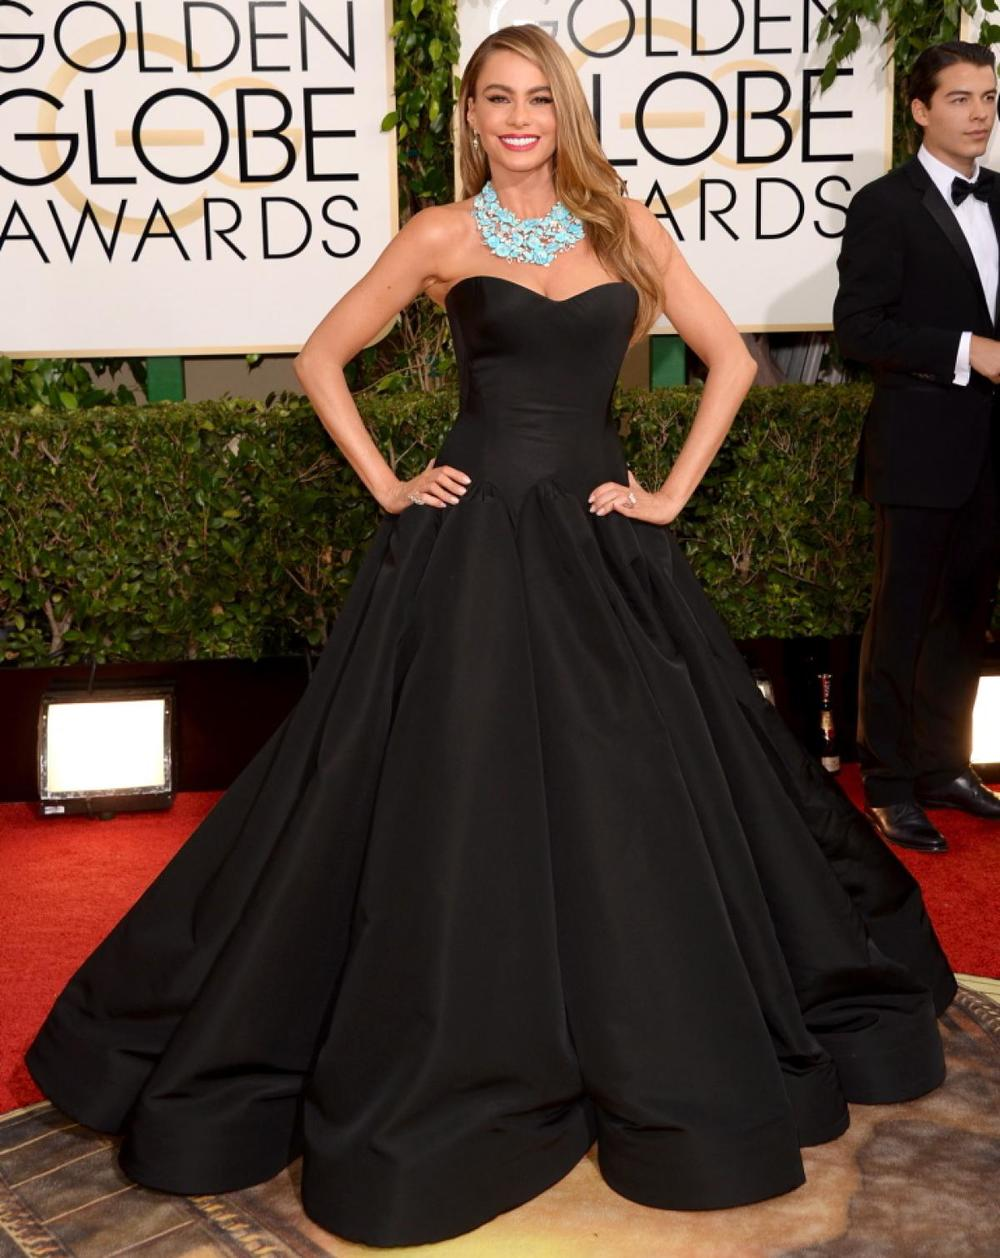 Sofia Vergara in black Zac Posen gown!